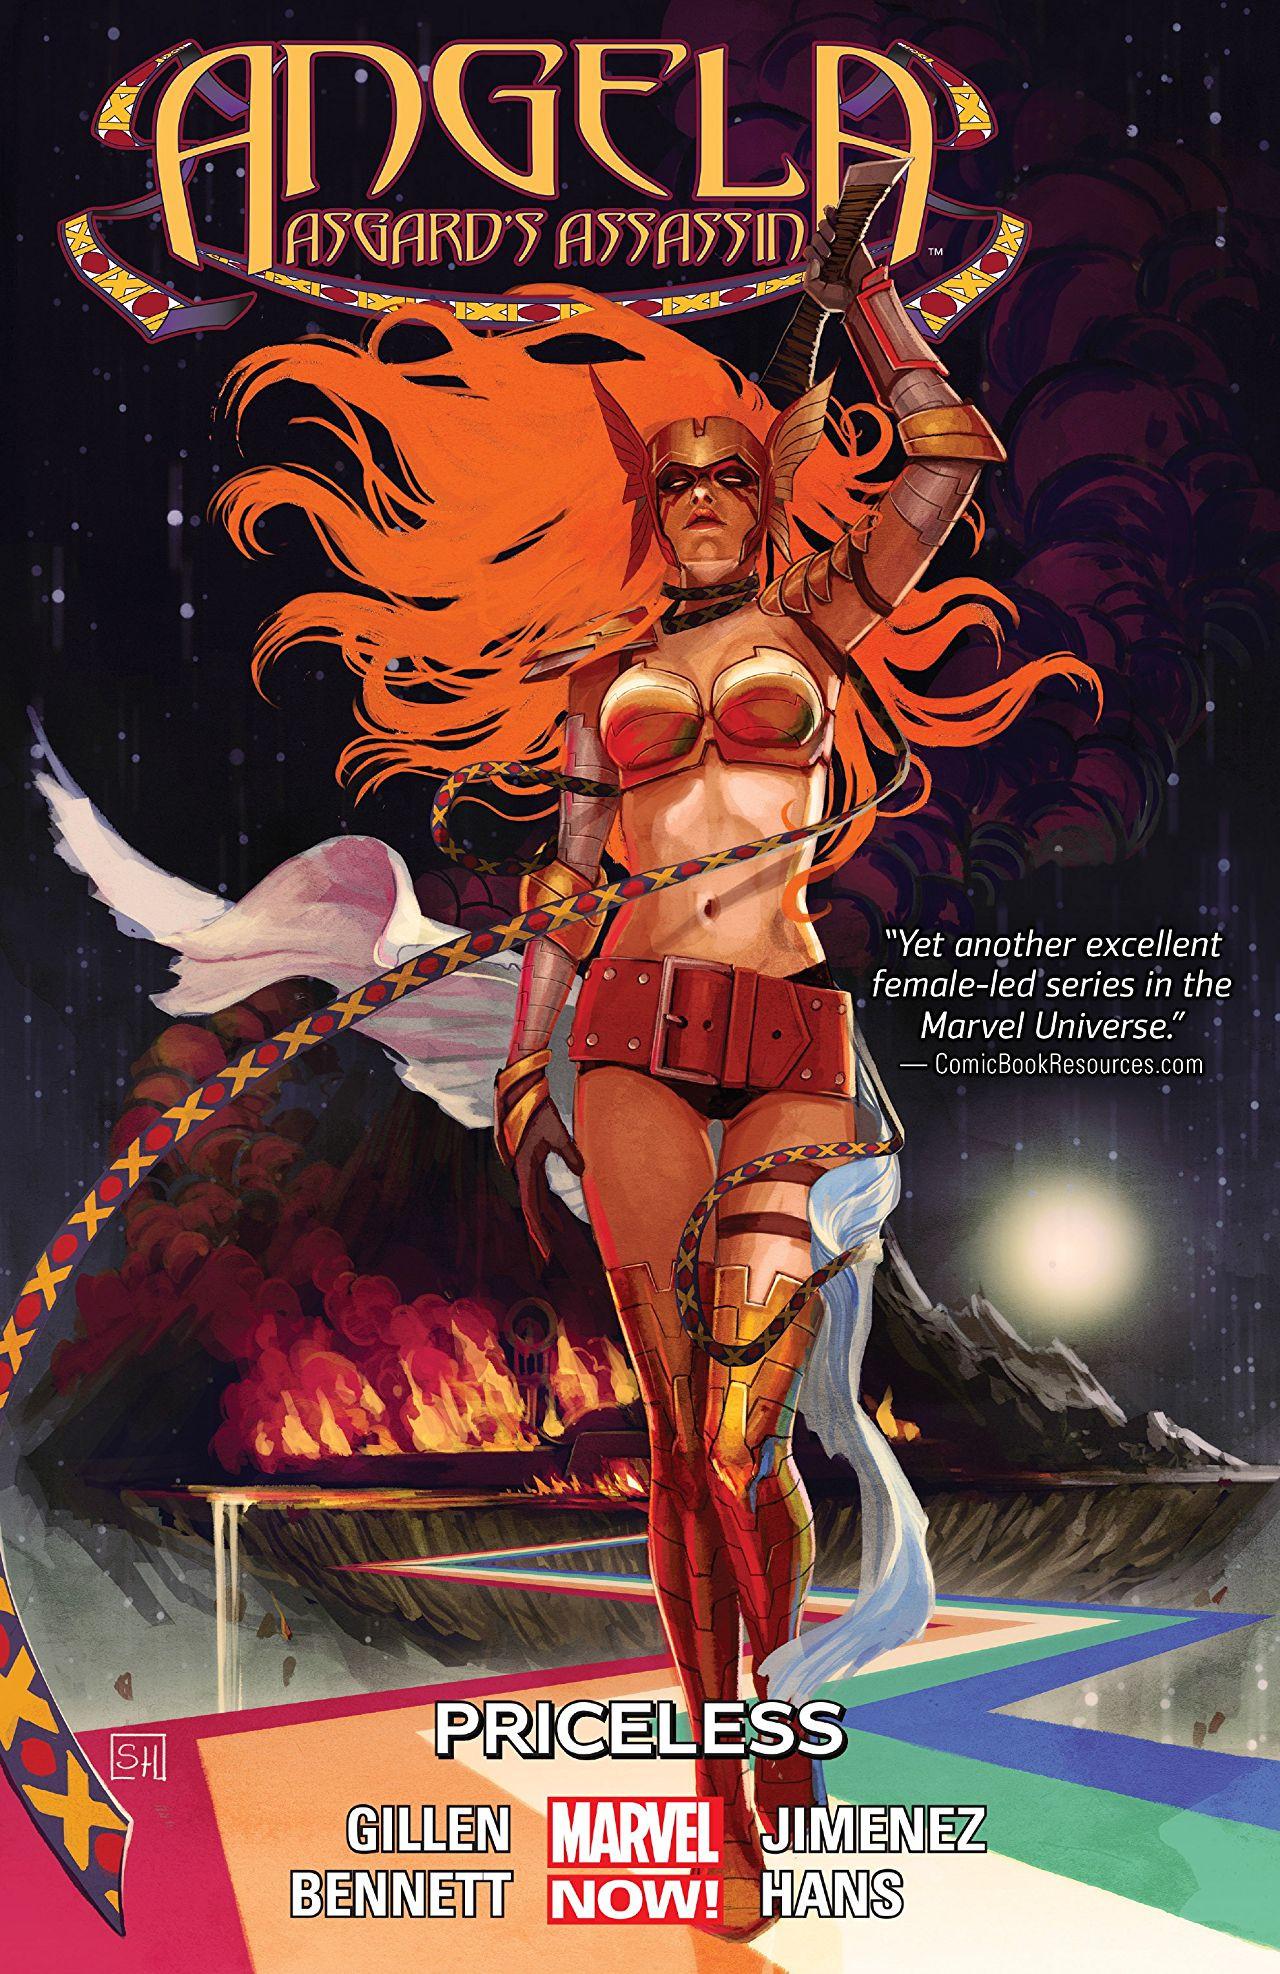 Angela: Asgard's Assassin TPB Vol 1 1: Priceless